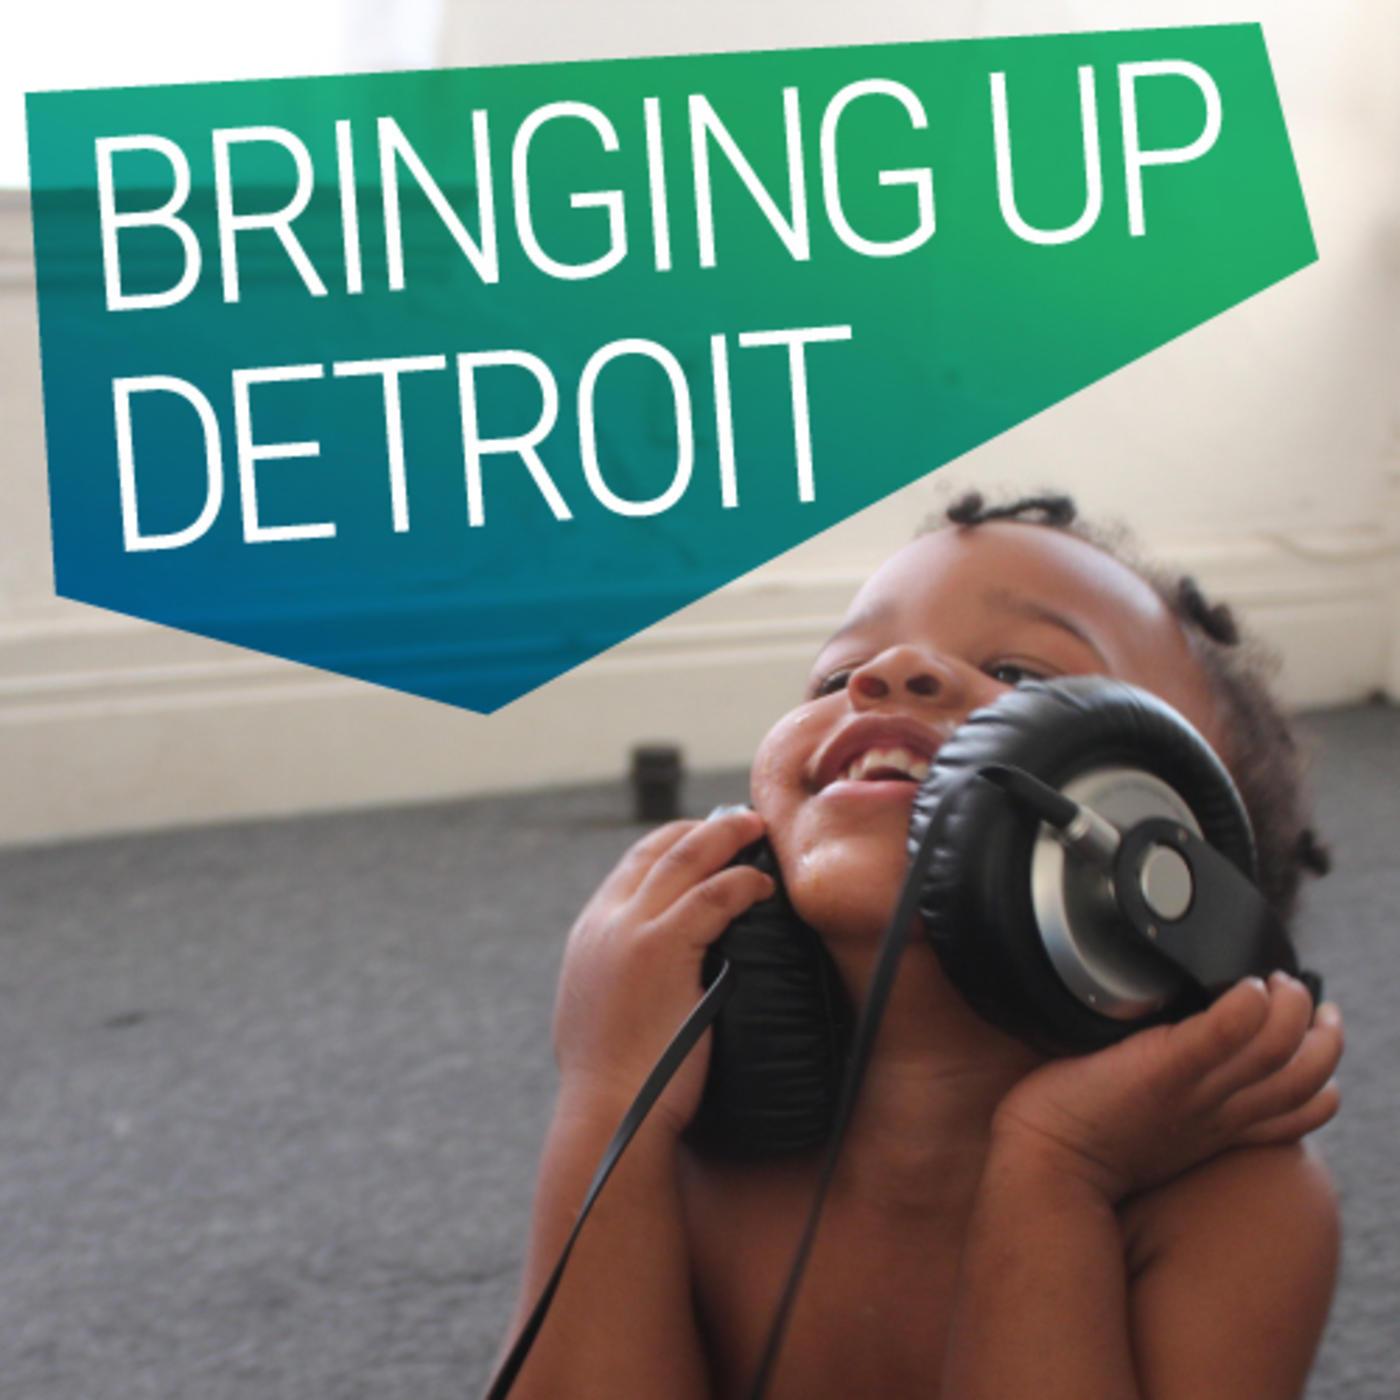 Bringing Up Detroit